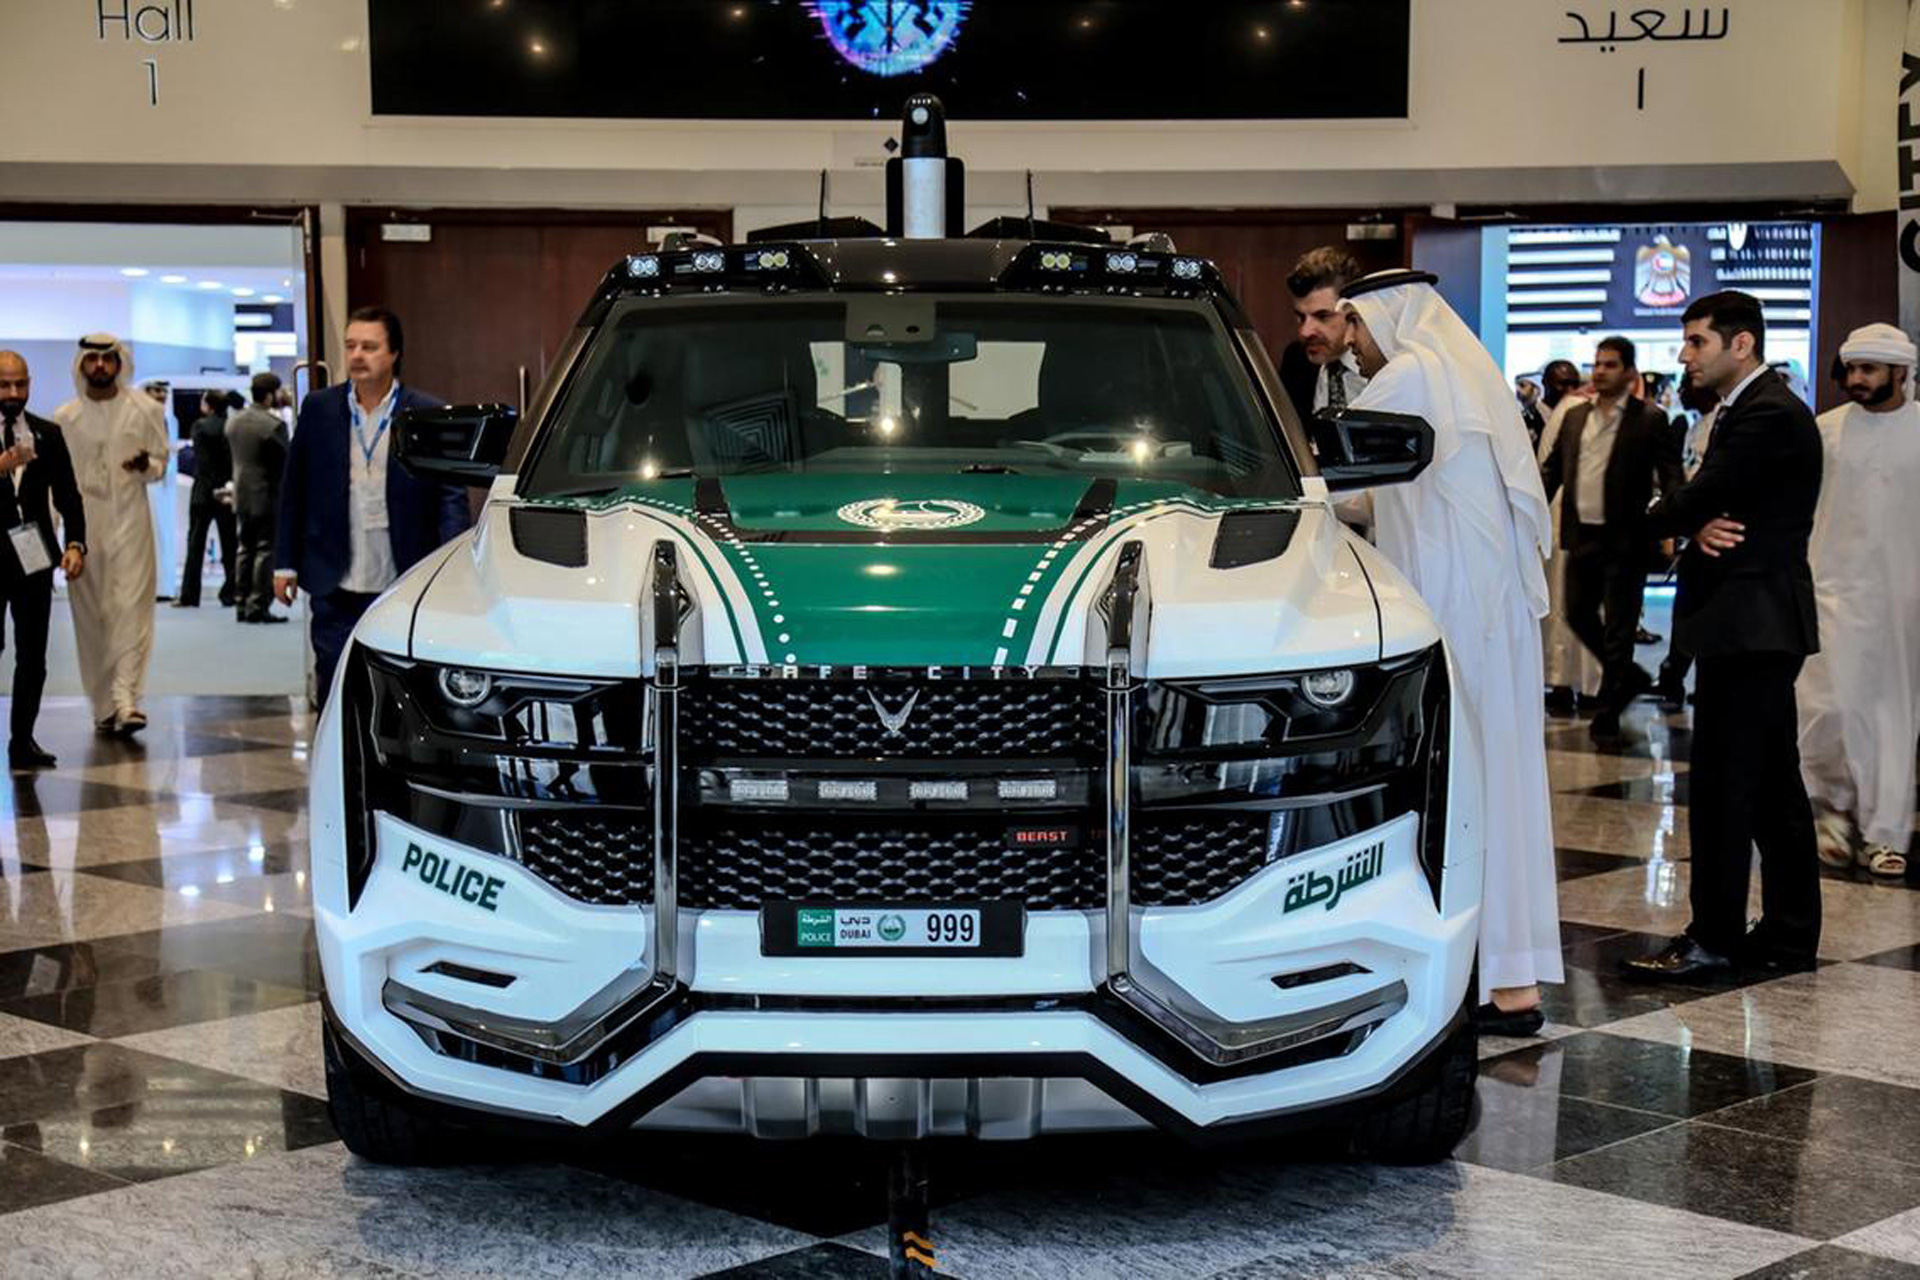 Beast Patrol Dubai Police Reveal Epic New Vehicle Dubai Police Cars